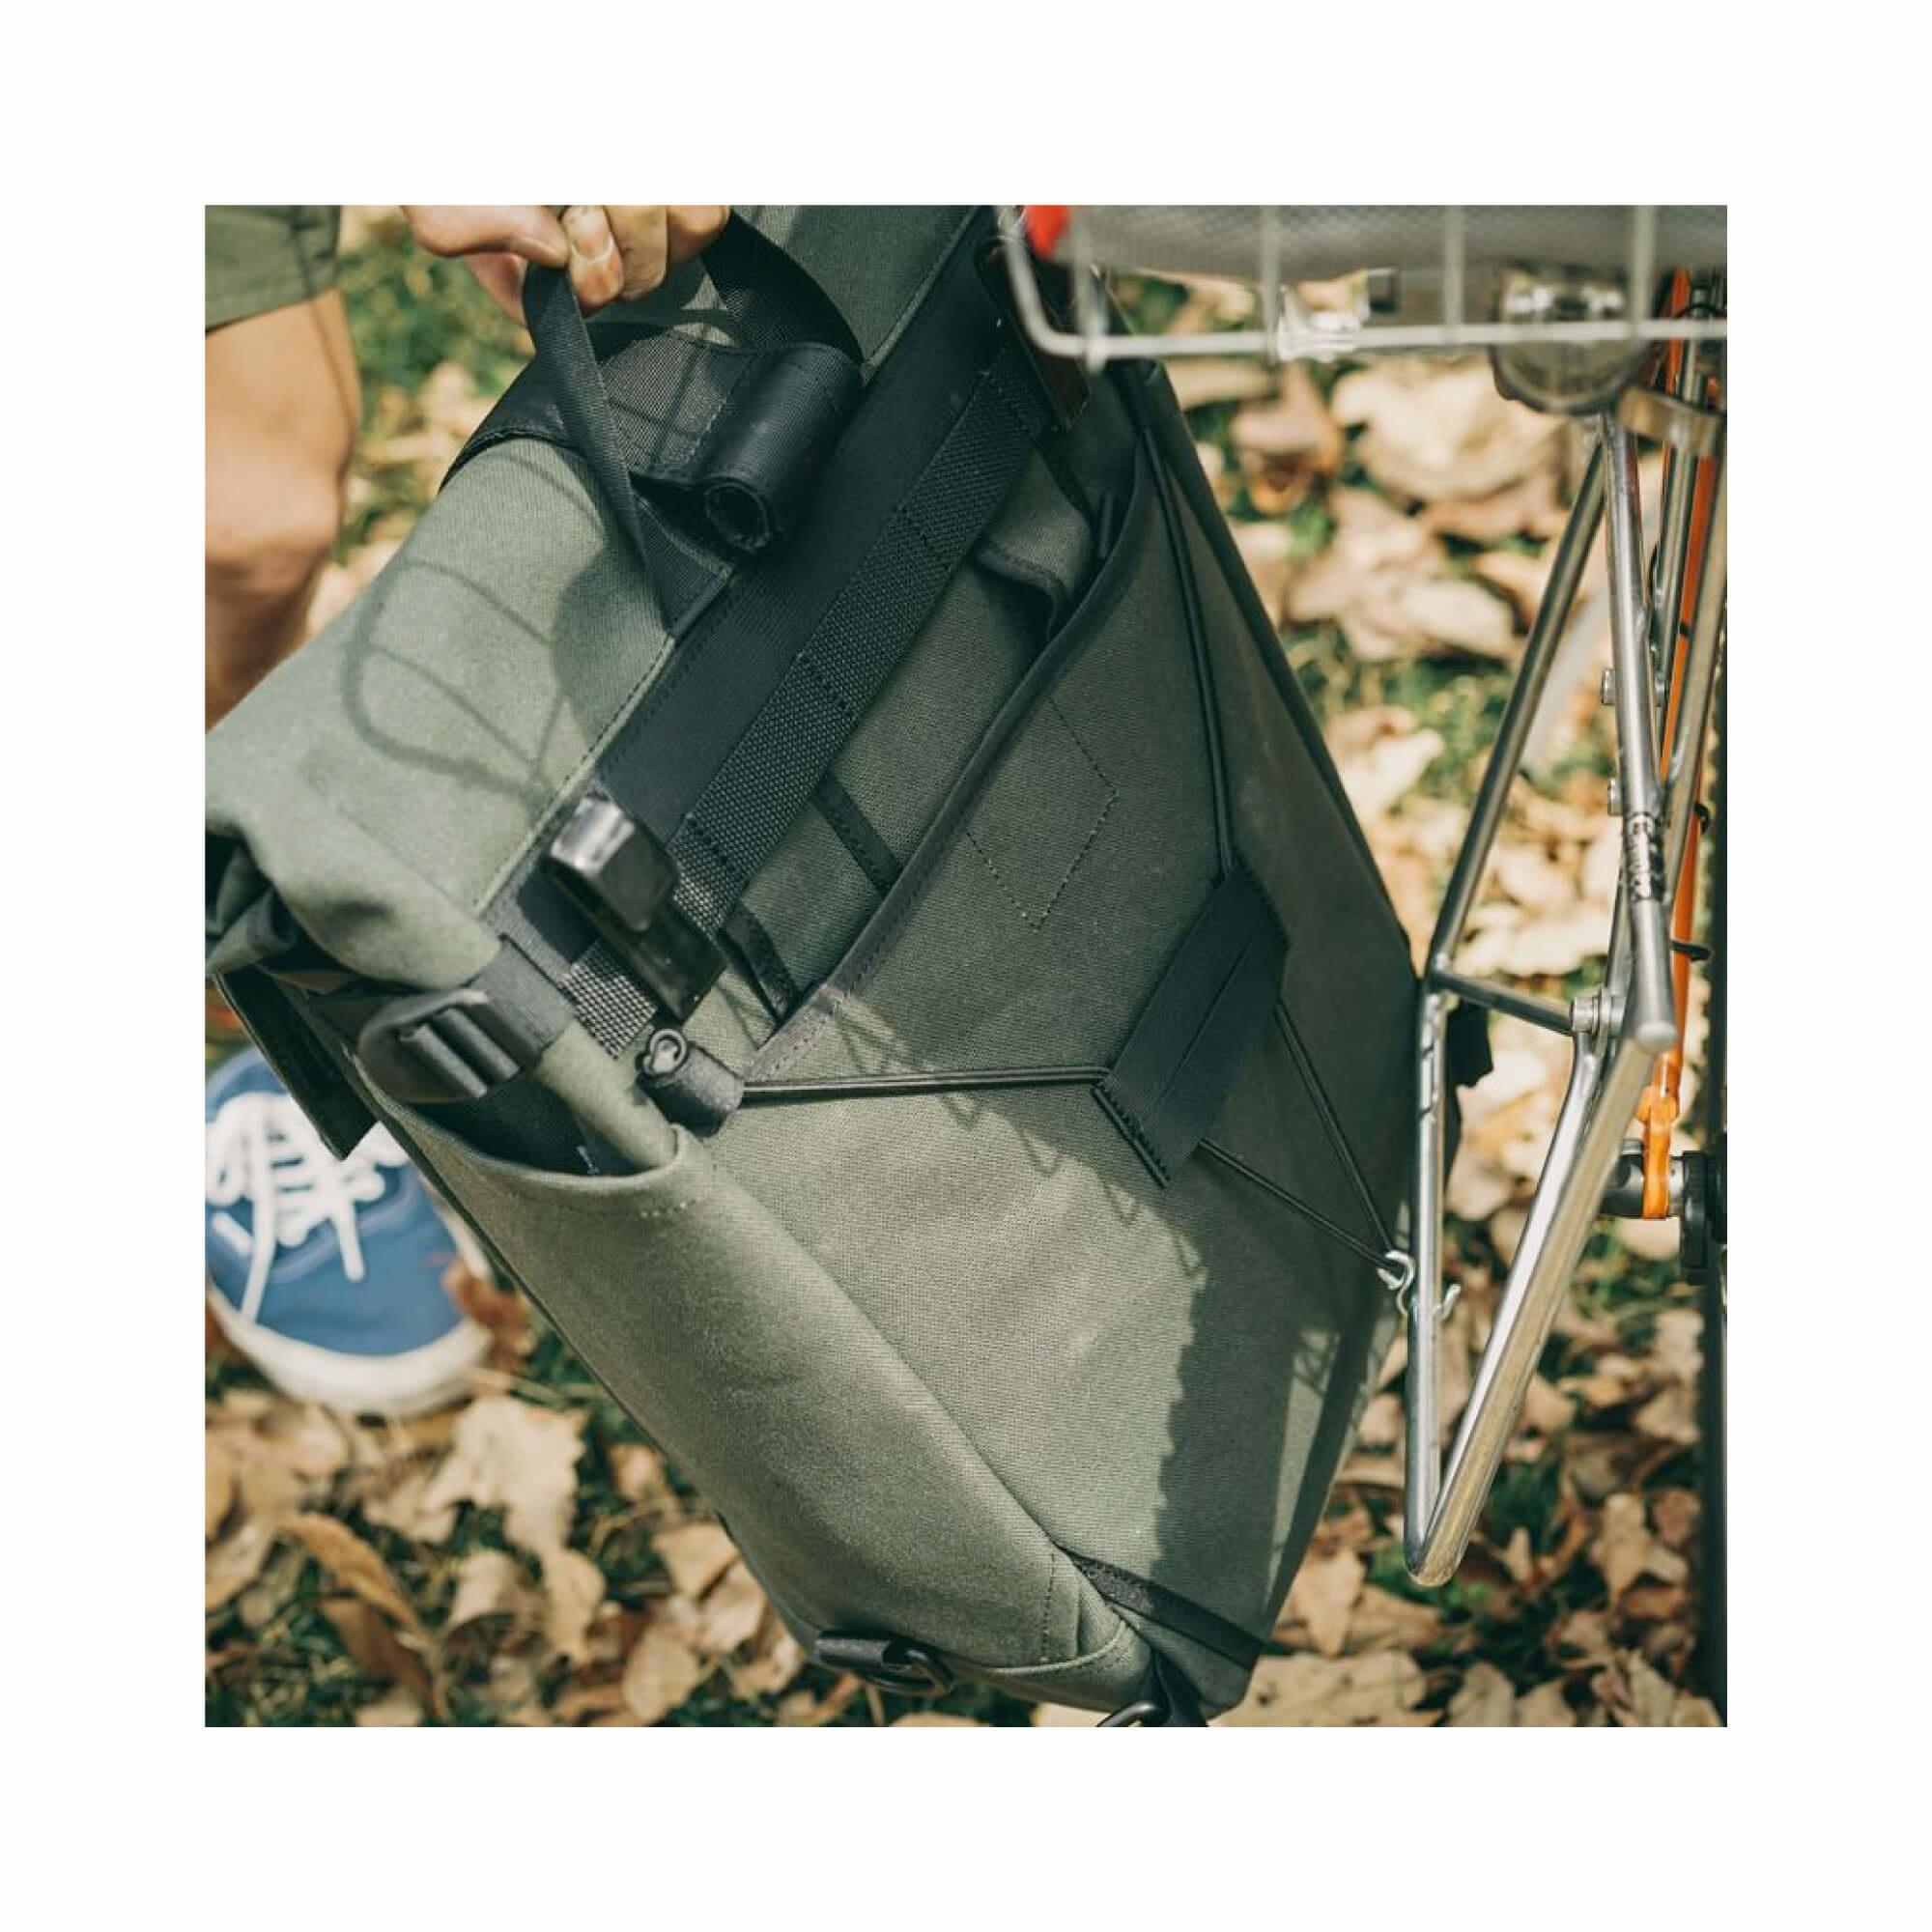 Roll Top Pannier Bag Black-8